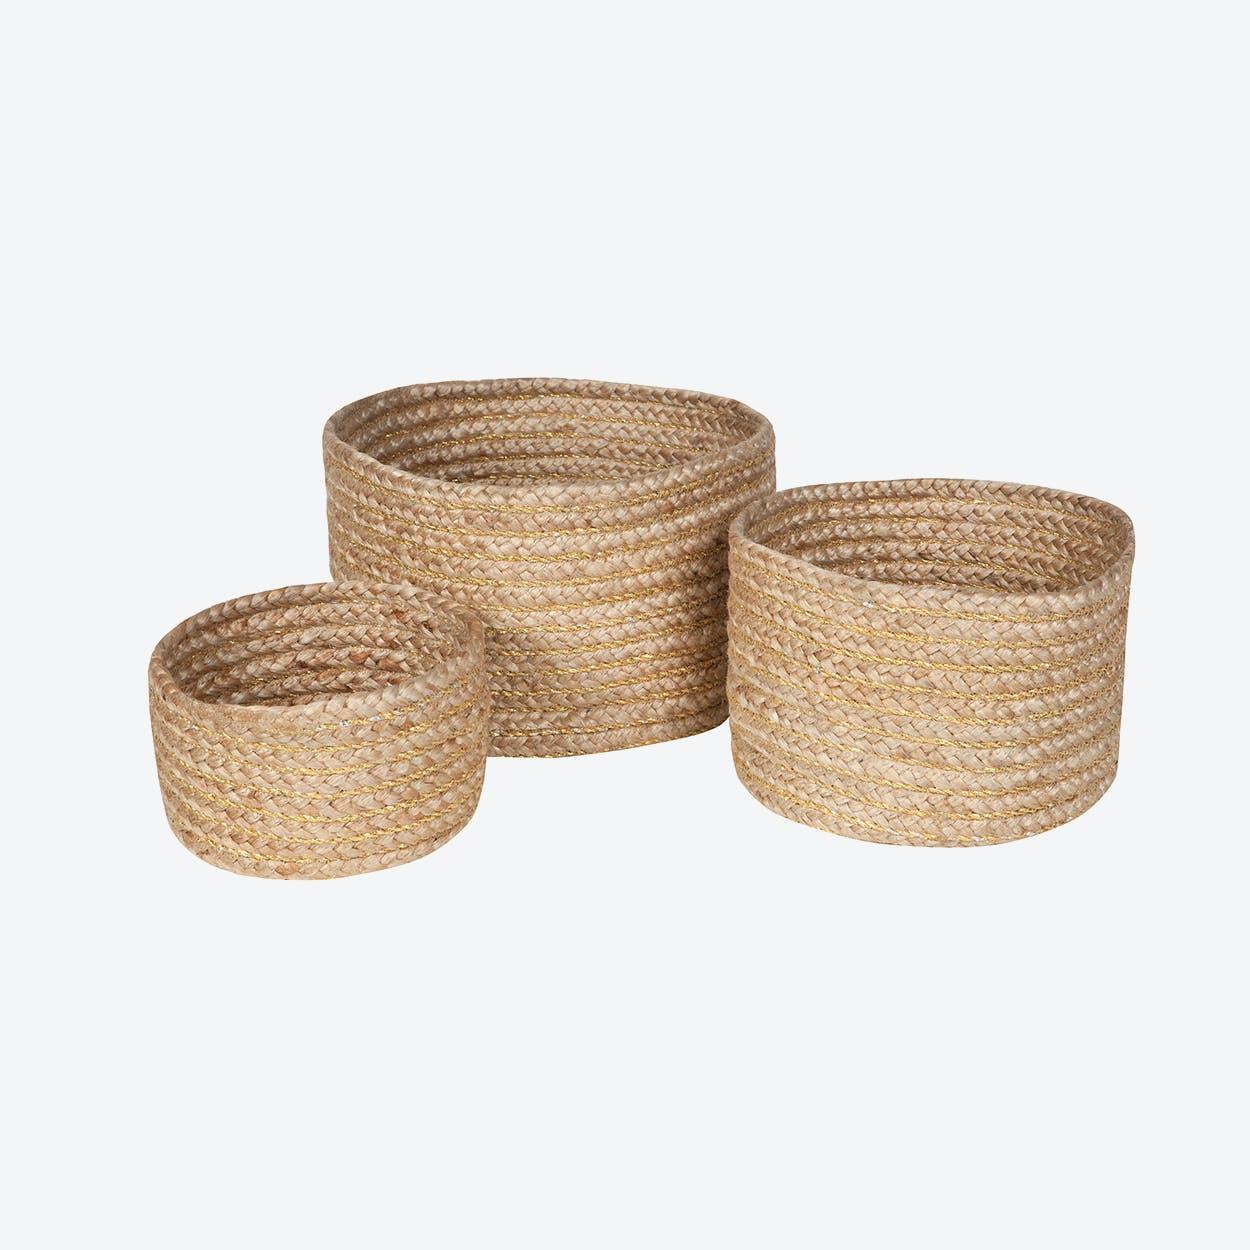 Abha Baskets - set of 3